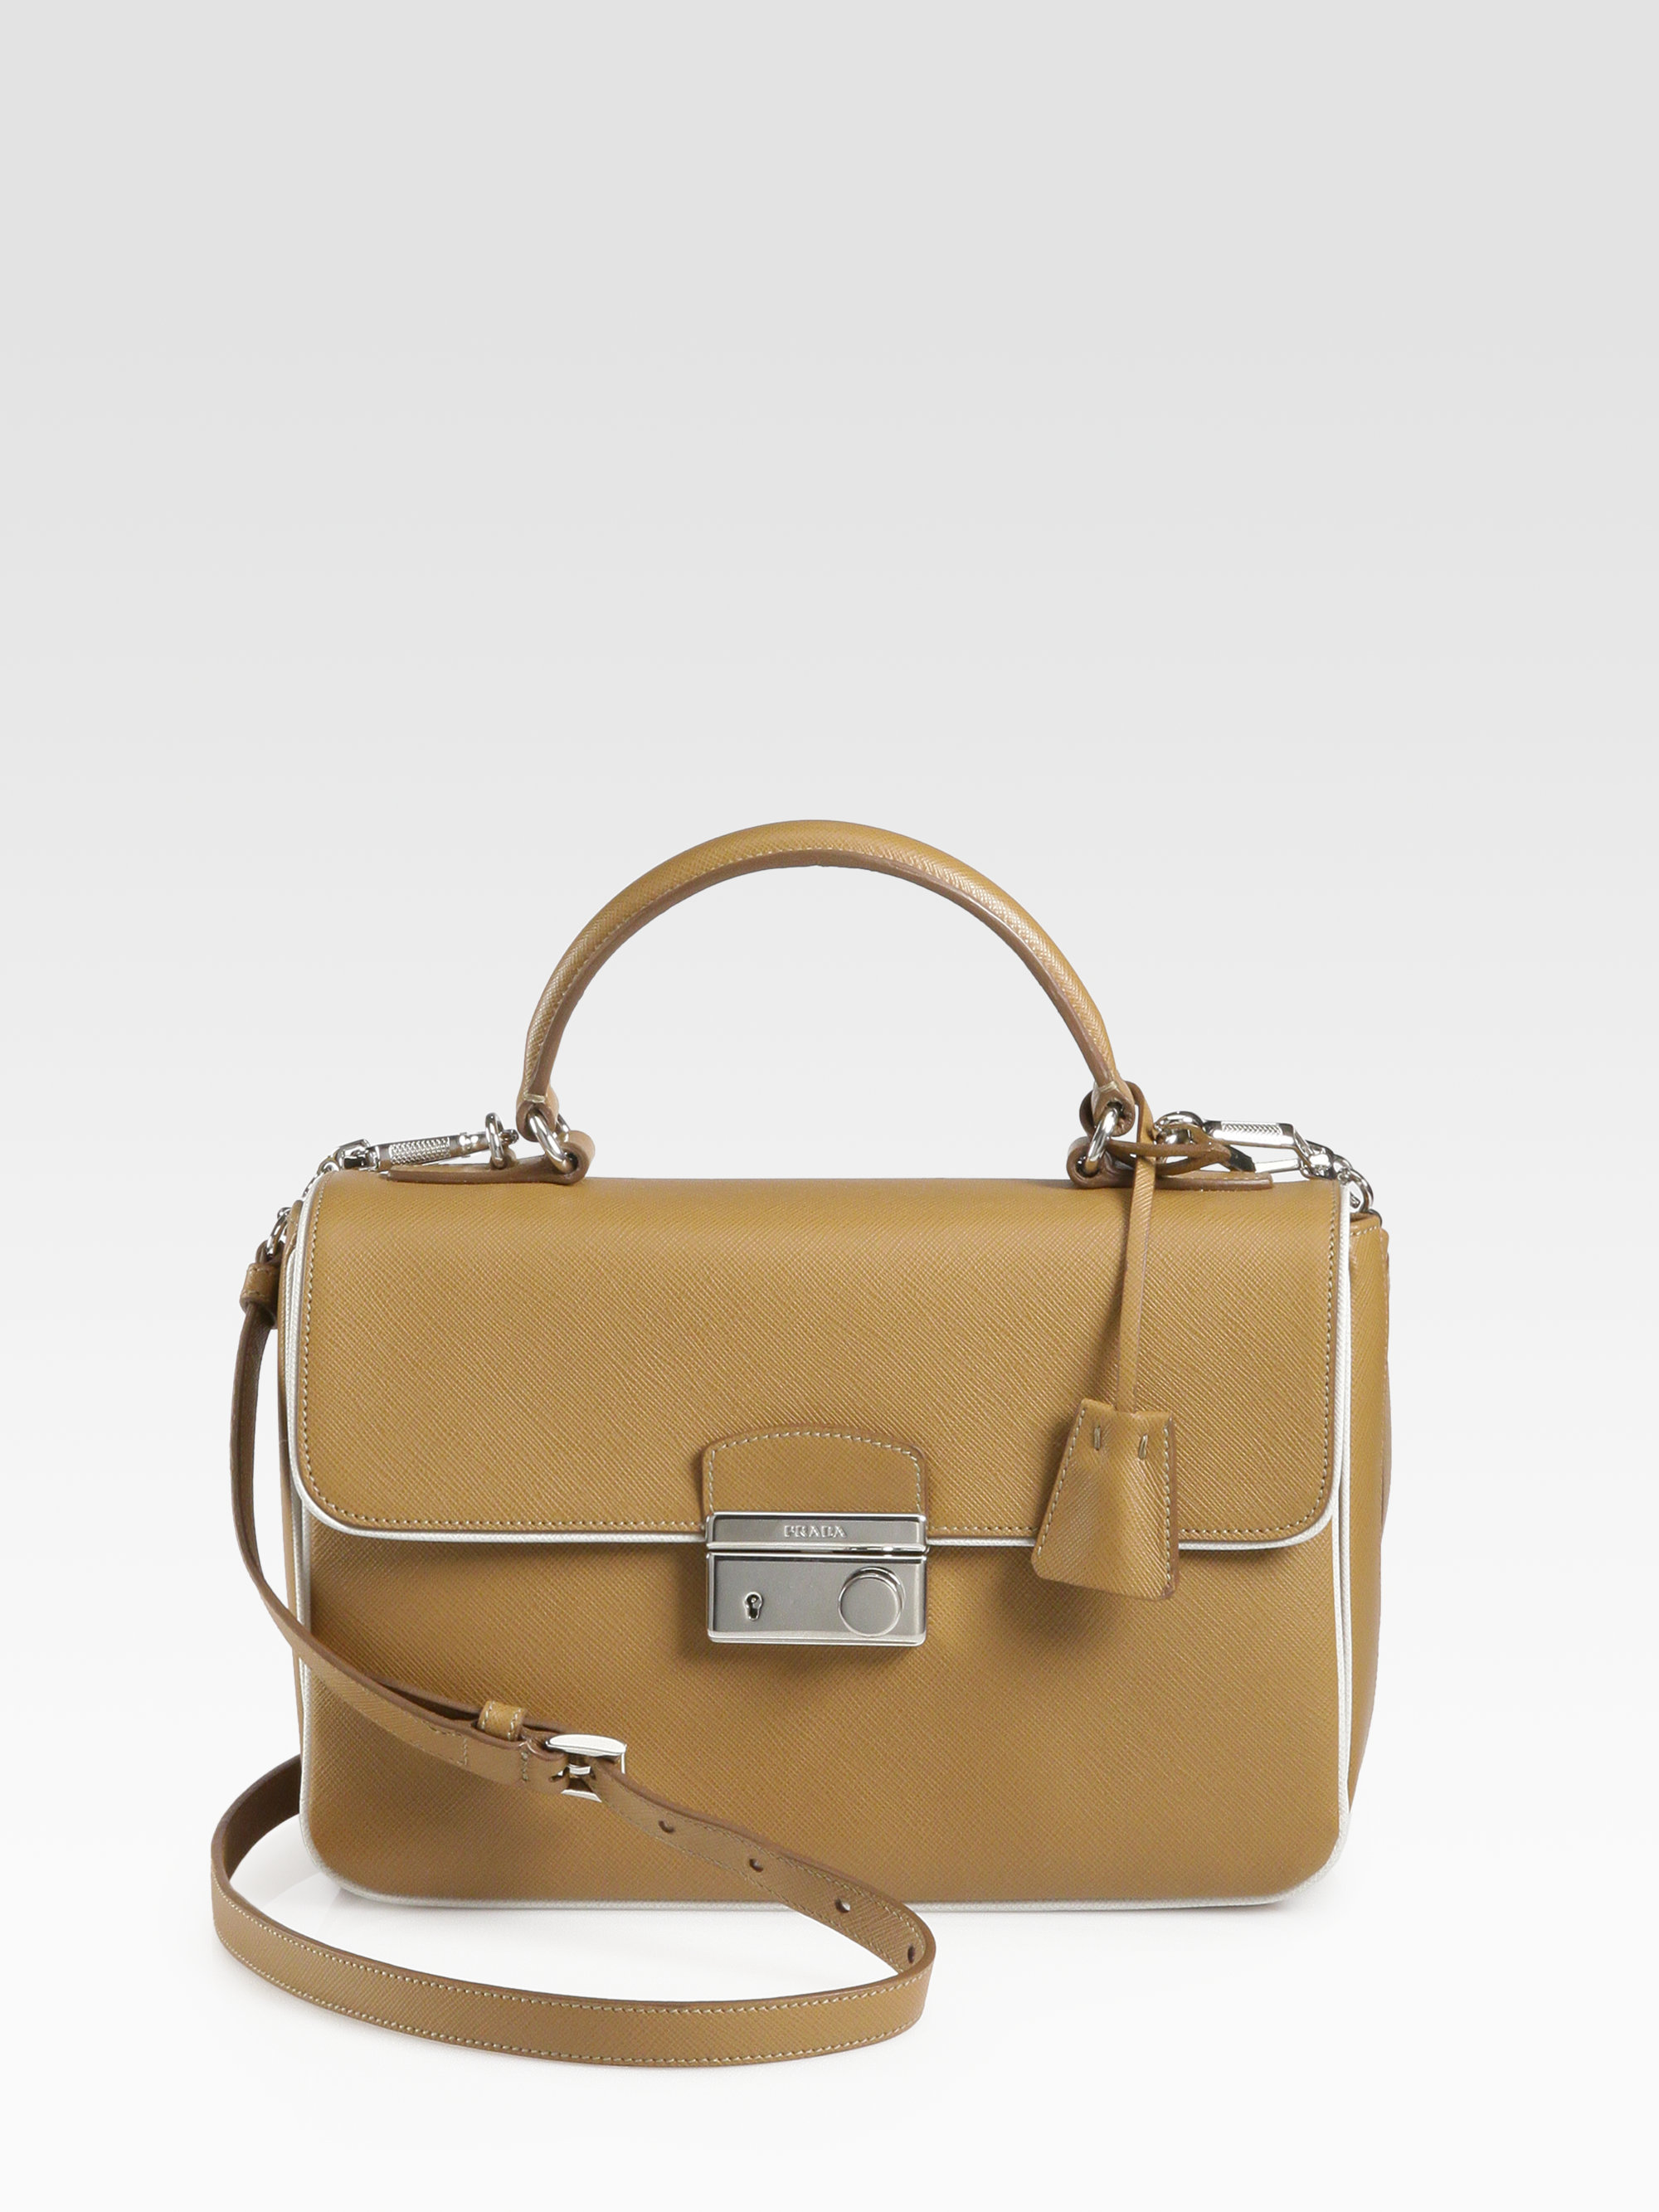 a9f0811f154005 Prada Saffiano Lux Crossbody Bag in Natural - Lyst